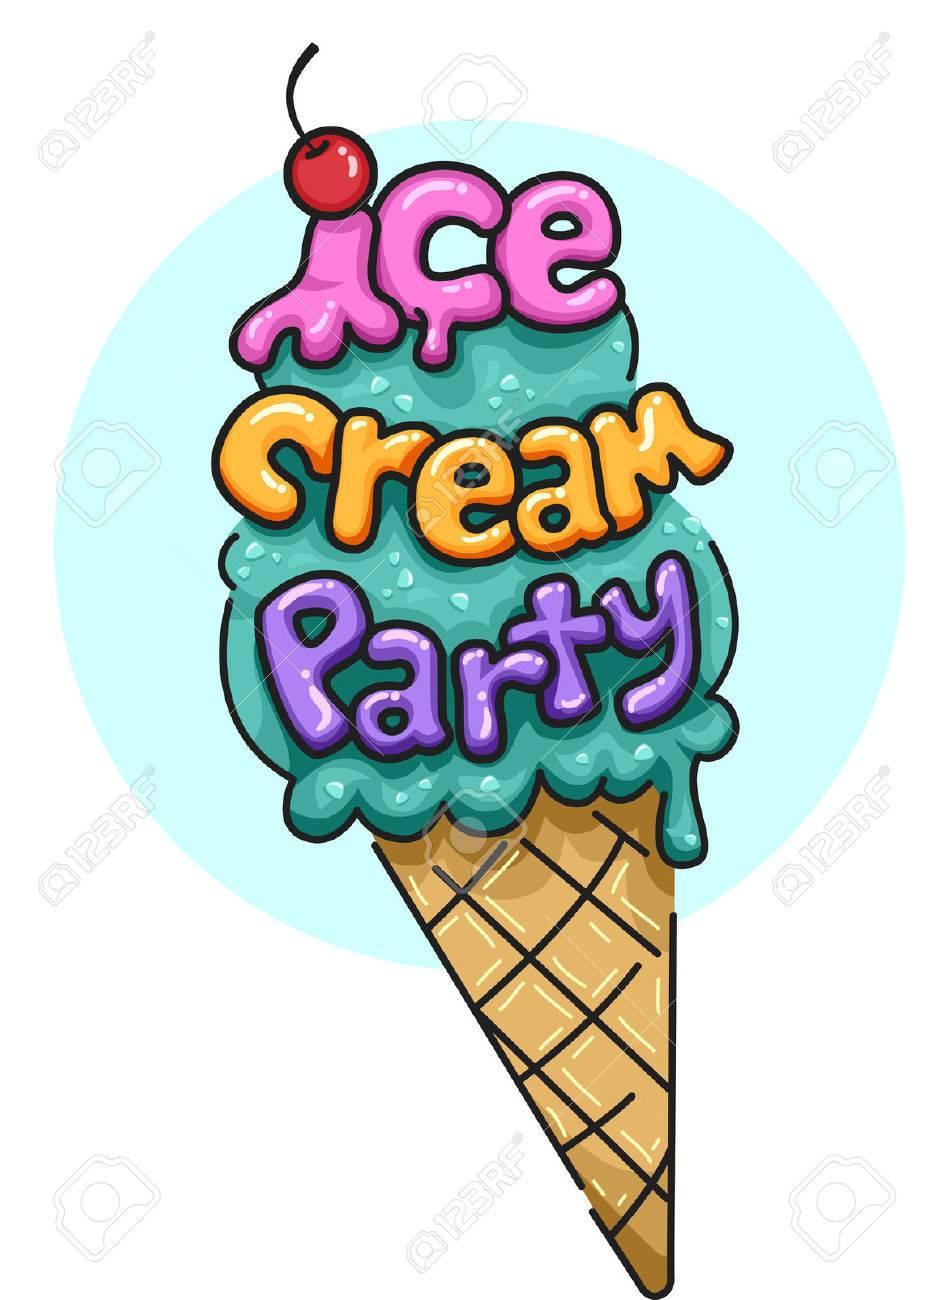 Decent Words Ice Cream Party Illustration Featuring An Ice Cream Cone Decorated Illustration Illustration Featuring An Ice Cream Cone Decorated Words baby Ice Cream Party